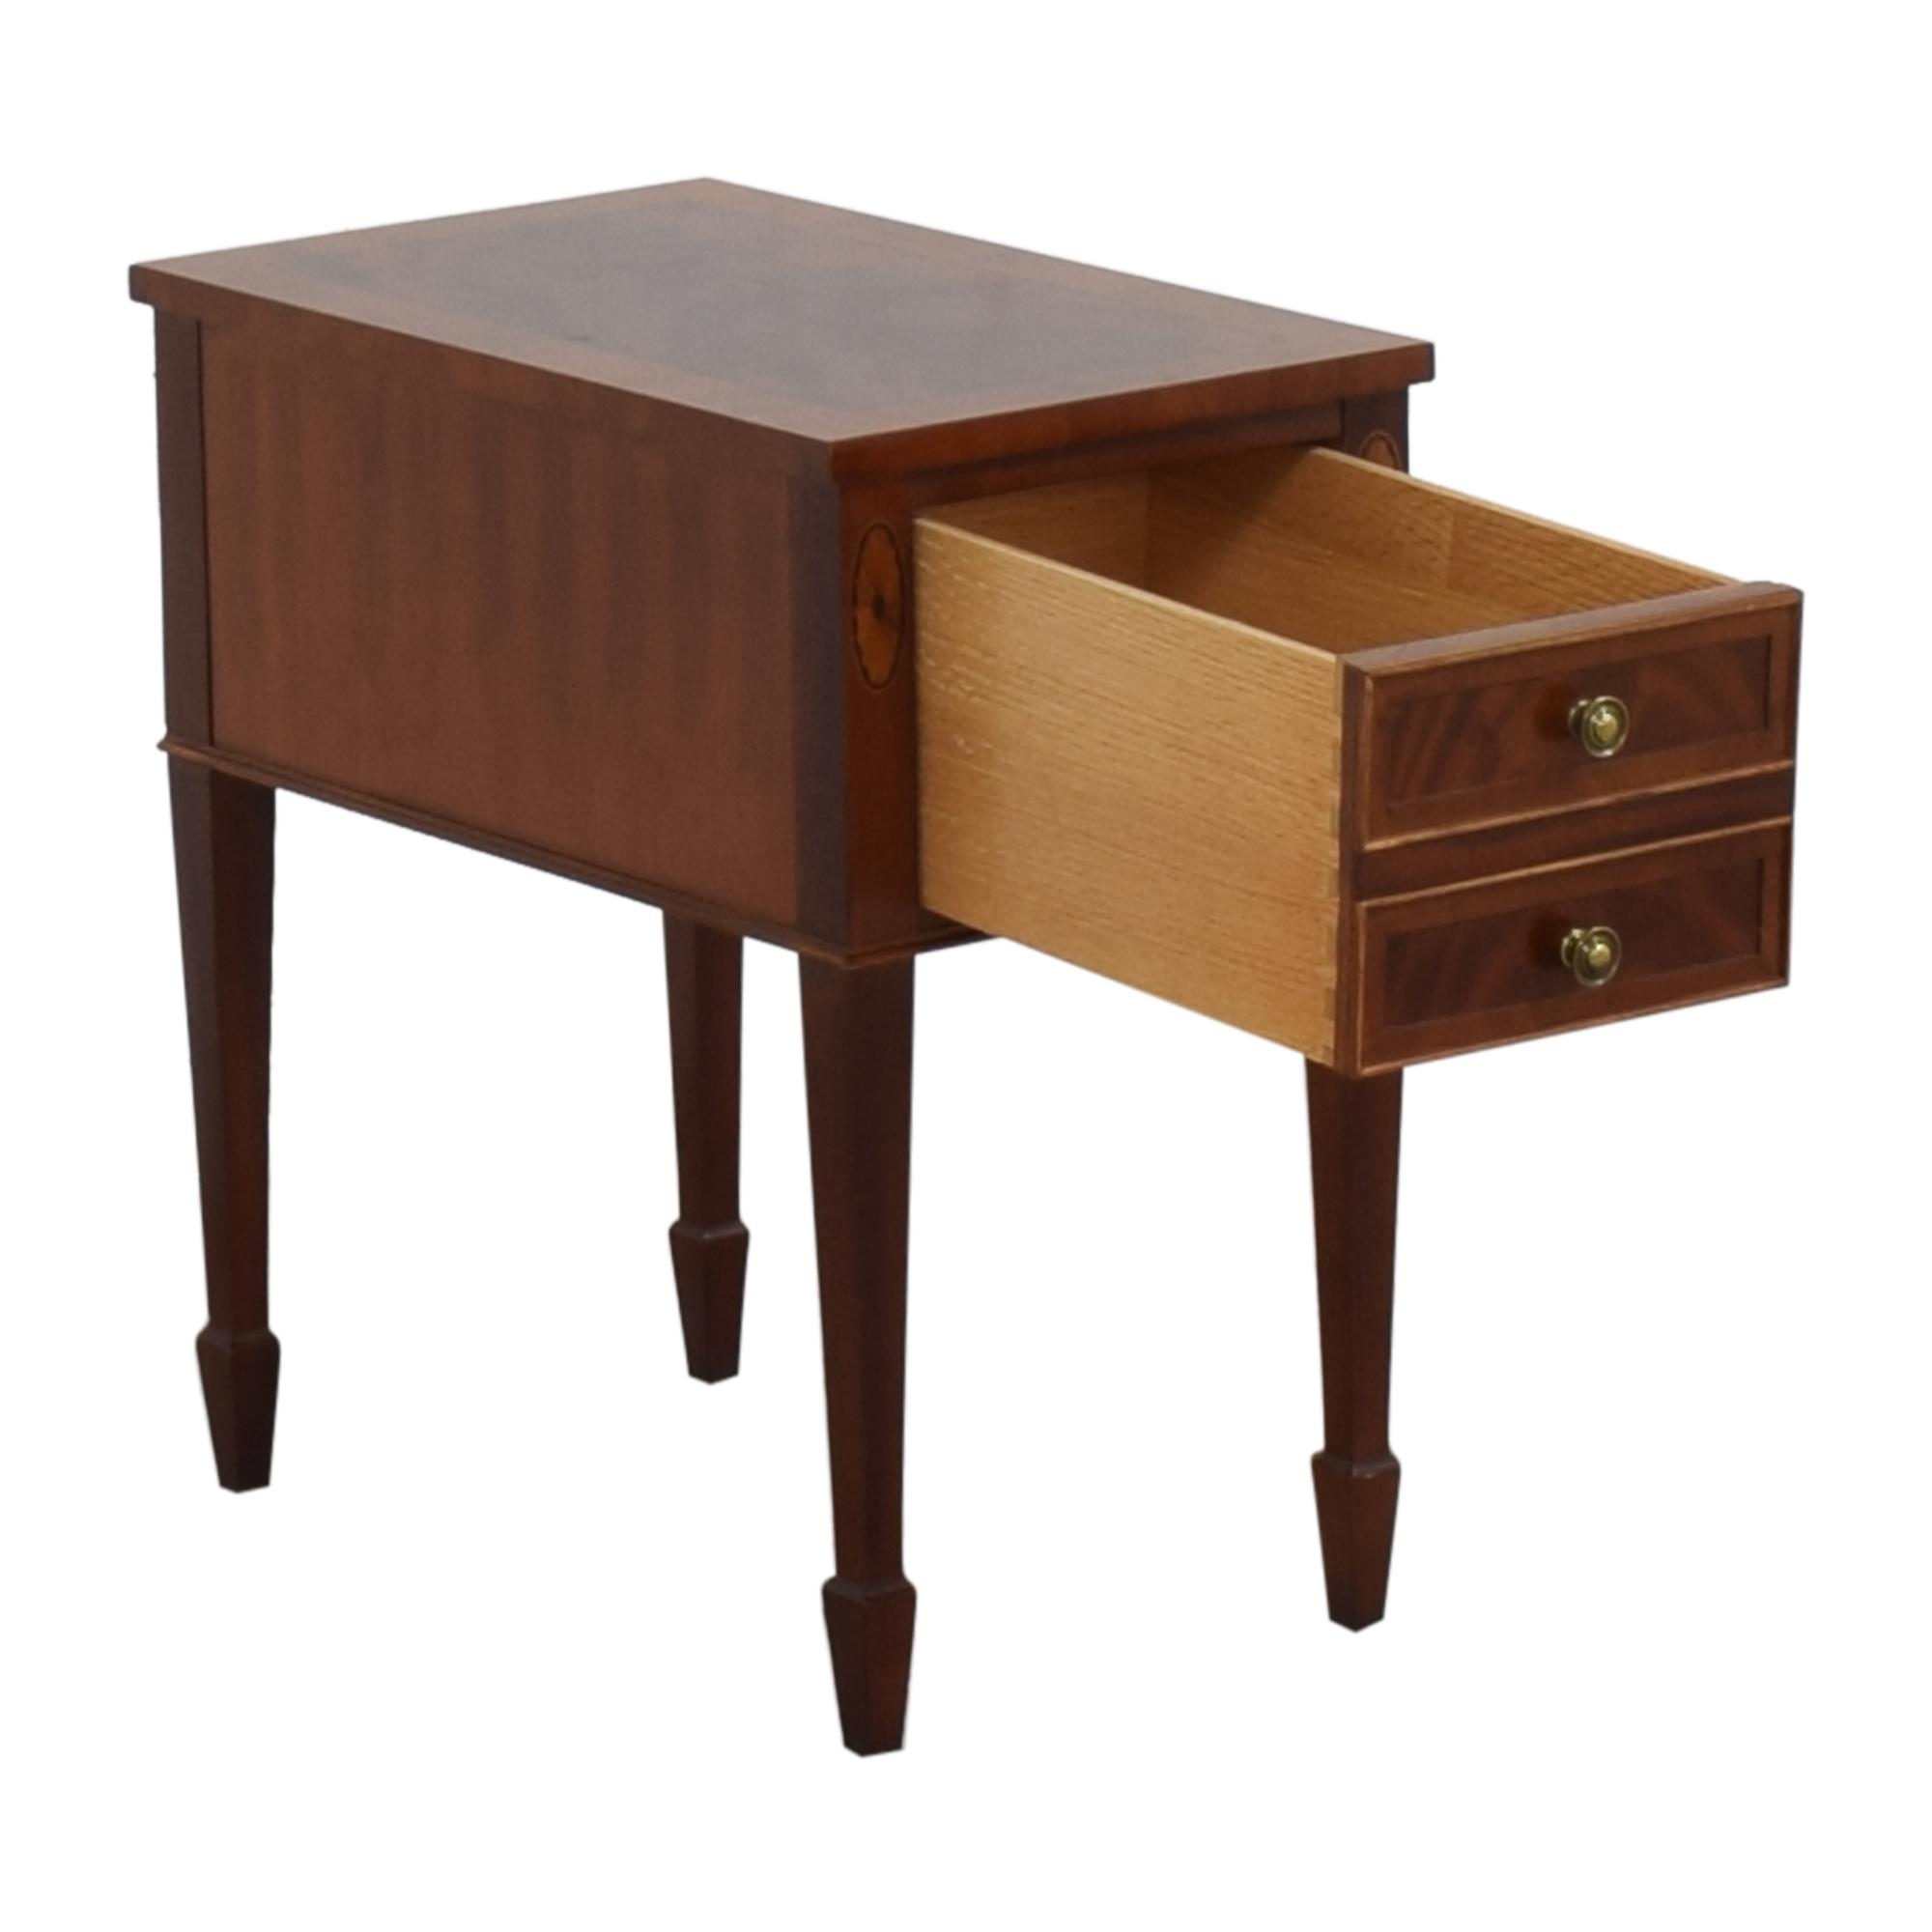 Hekman Furniture Hekman Chairside Table ct